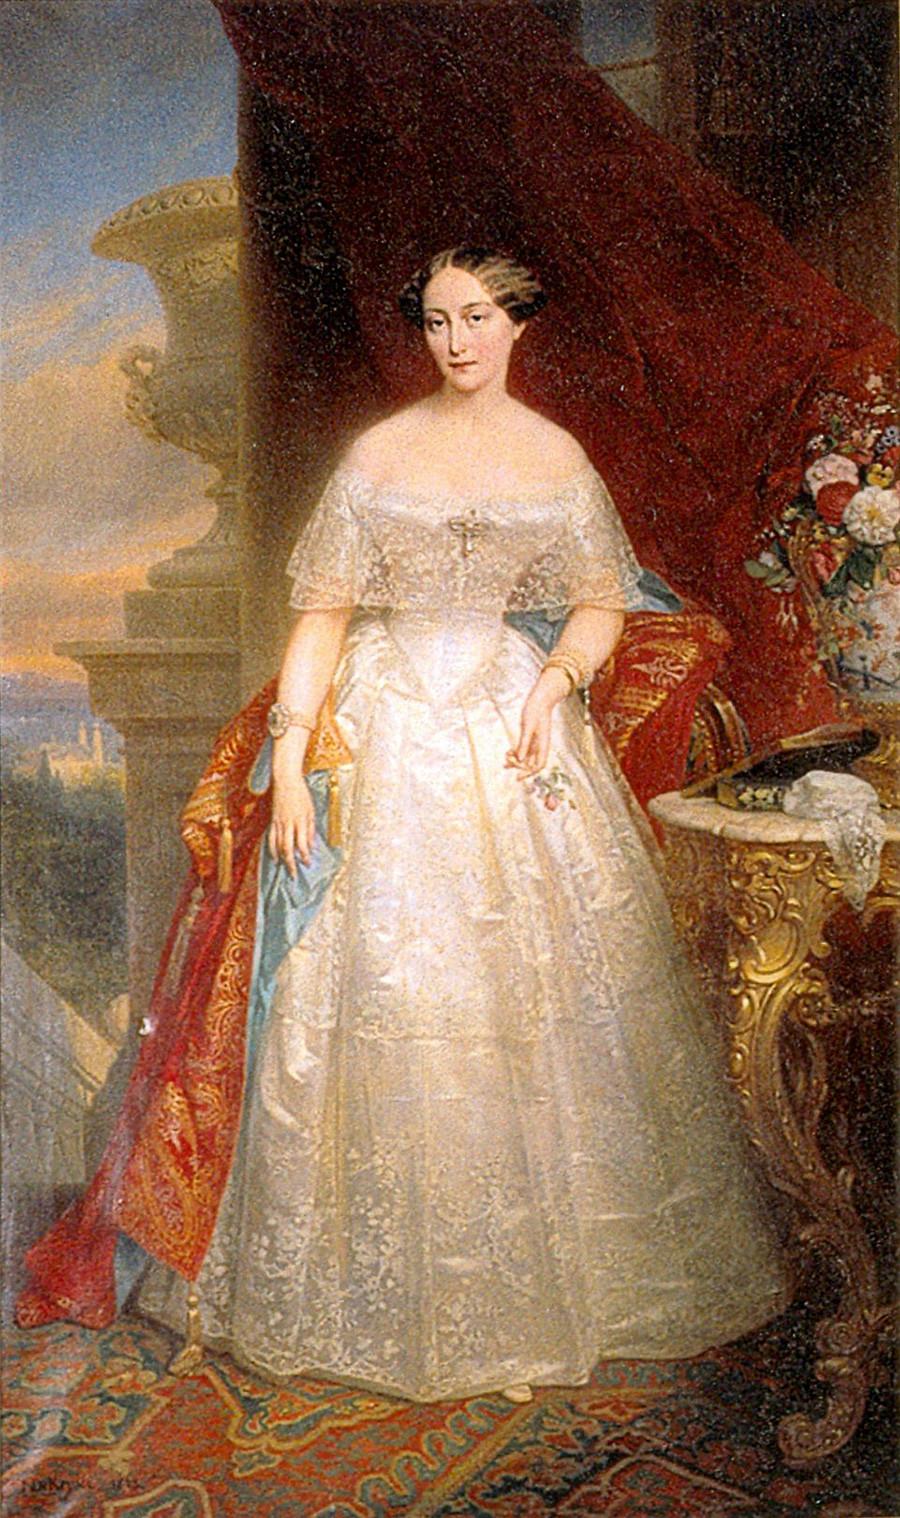 Princeza Olga od Württemberga (1822.-1892.), Nicaise de Keyser.